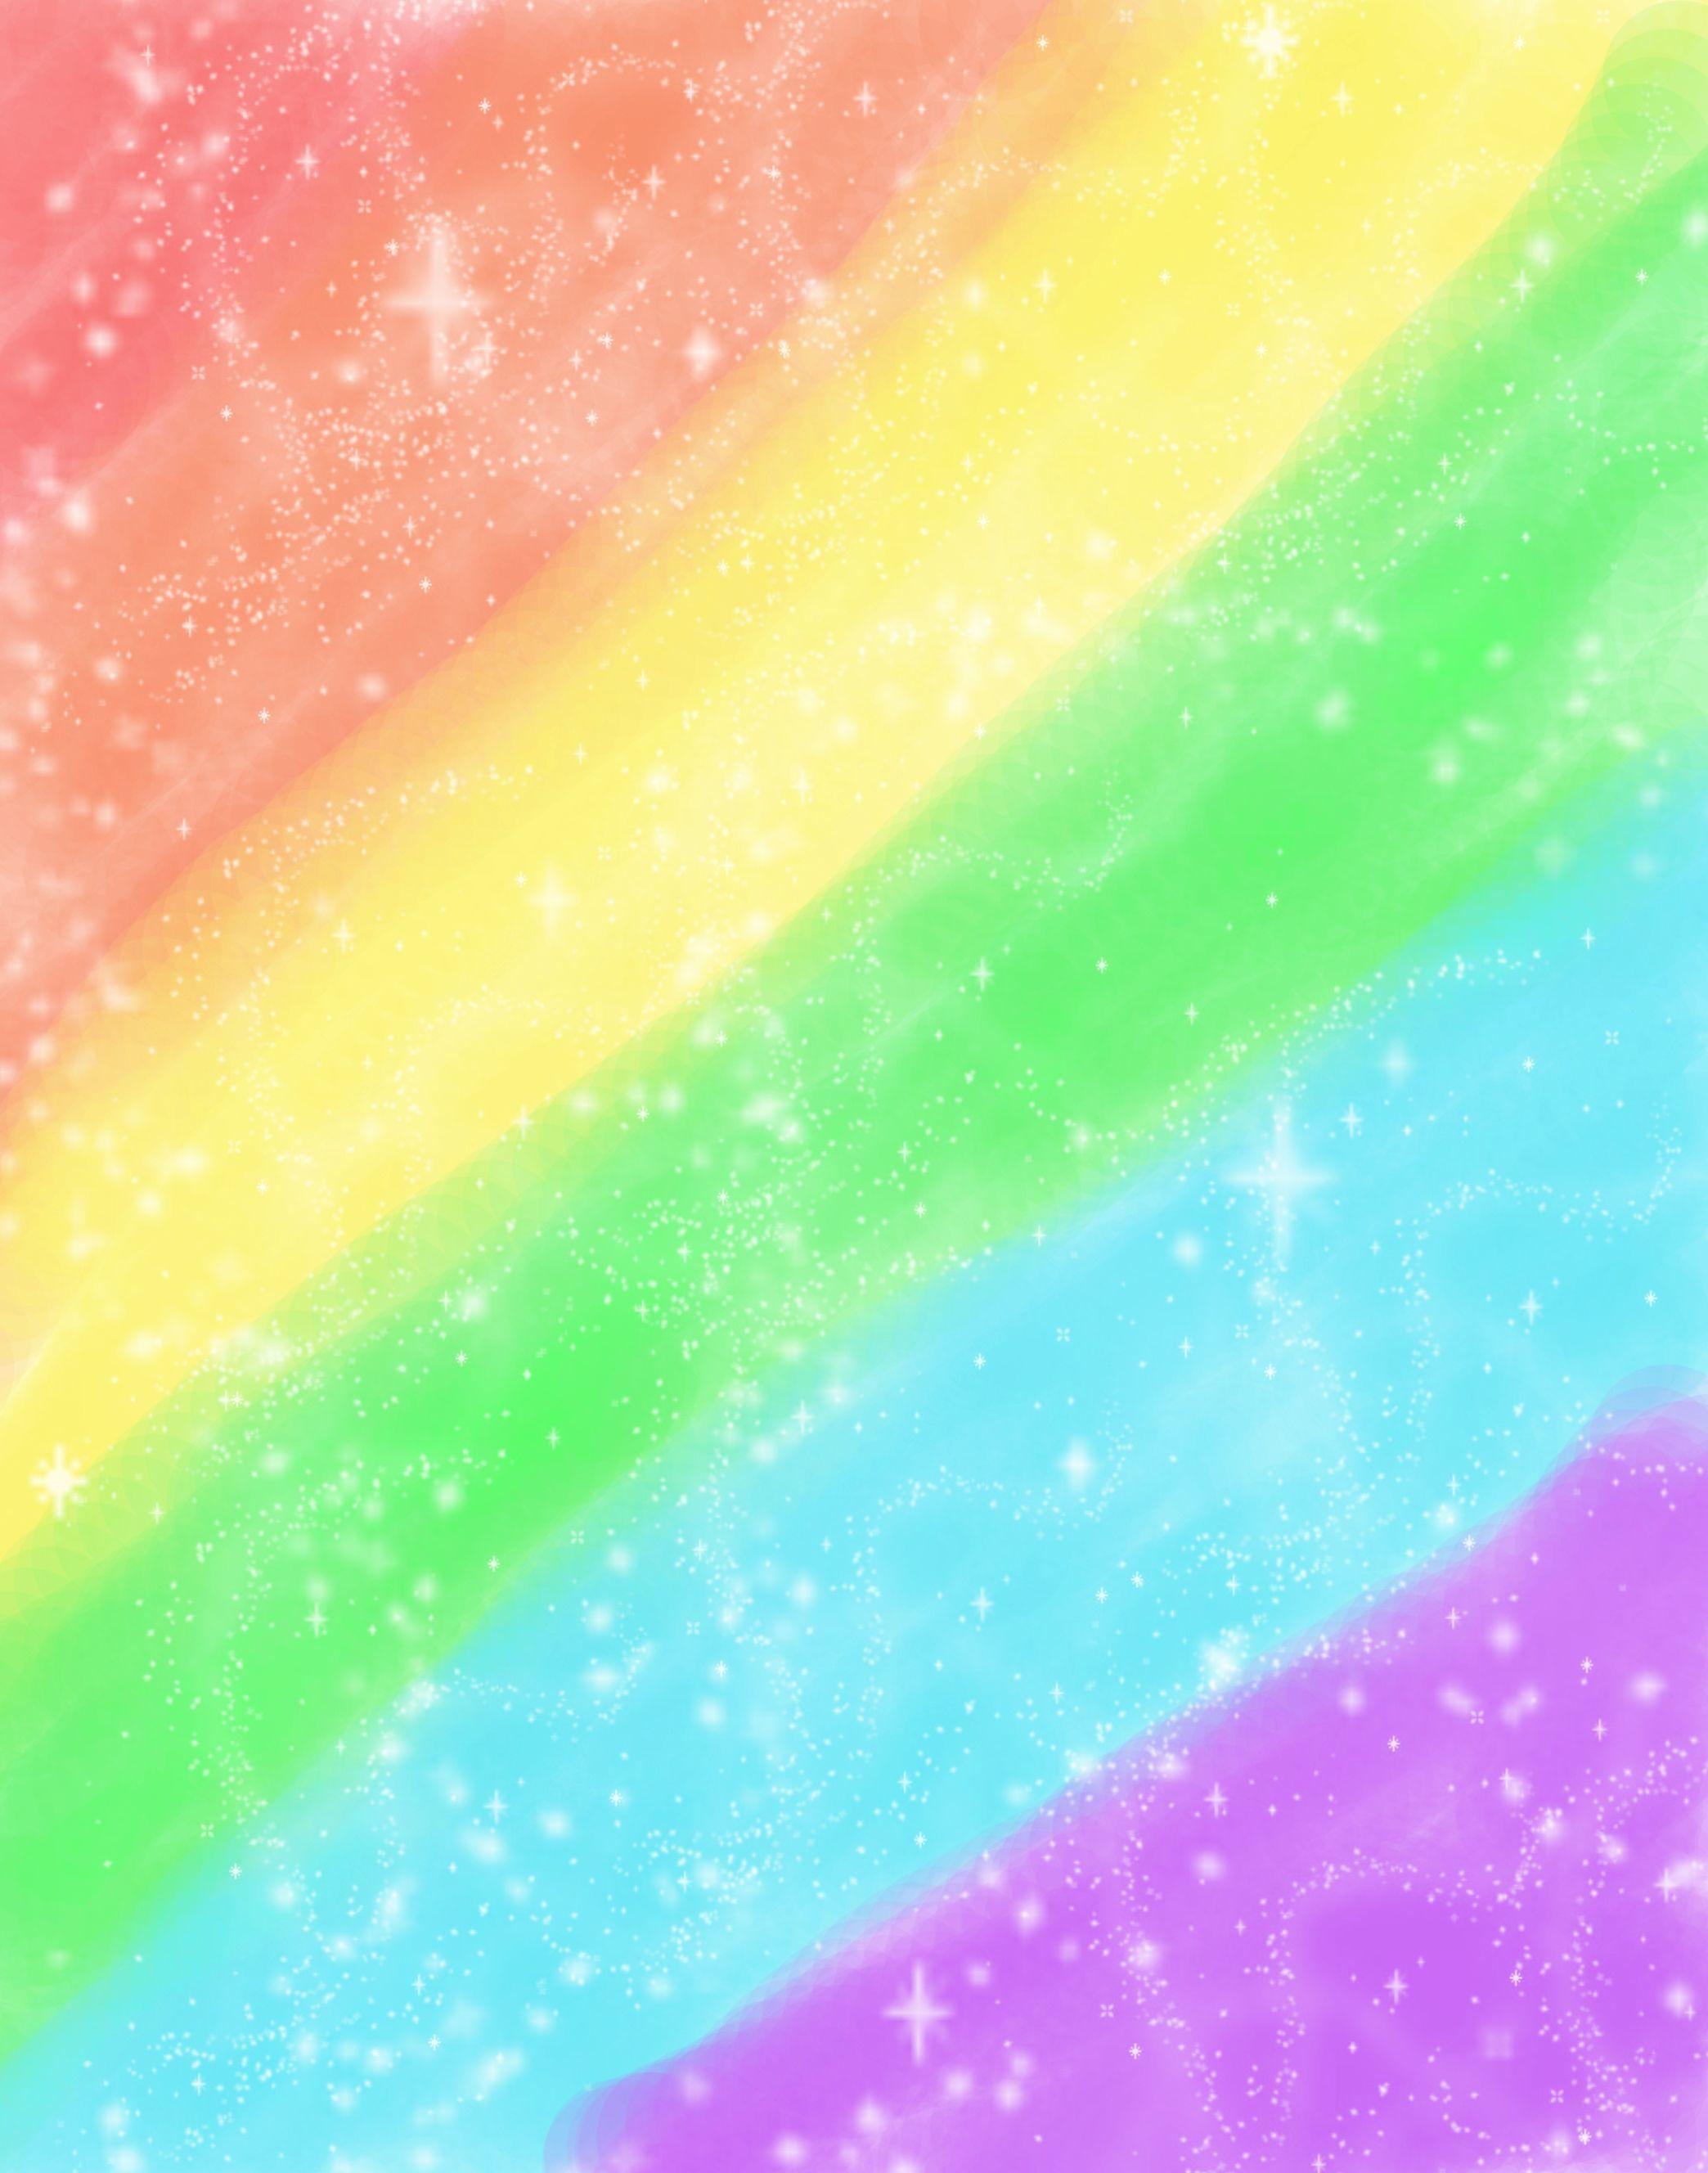 Glitter Backgrounds   Backgrounds Glitter   Backgrounds ...